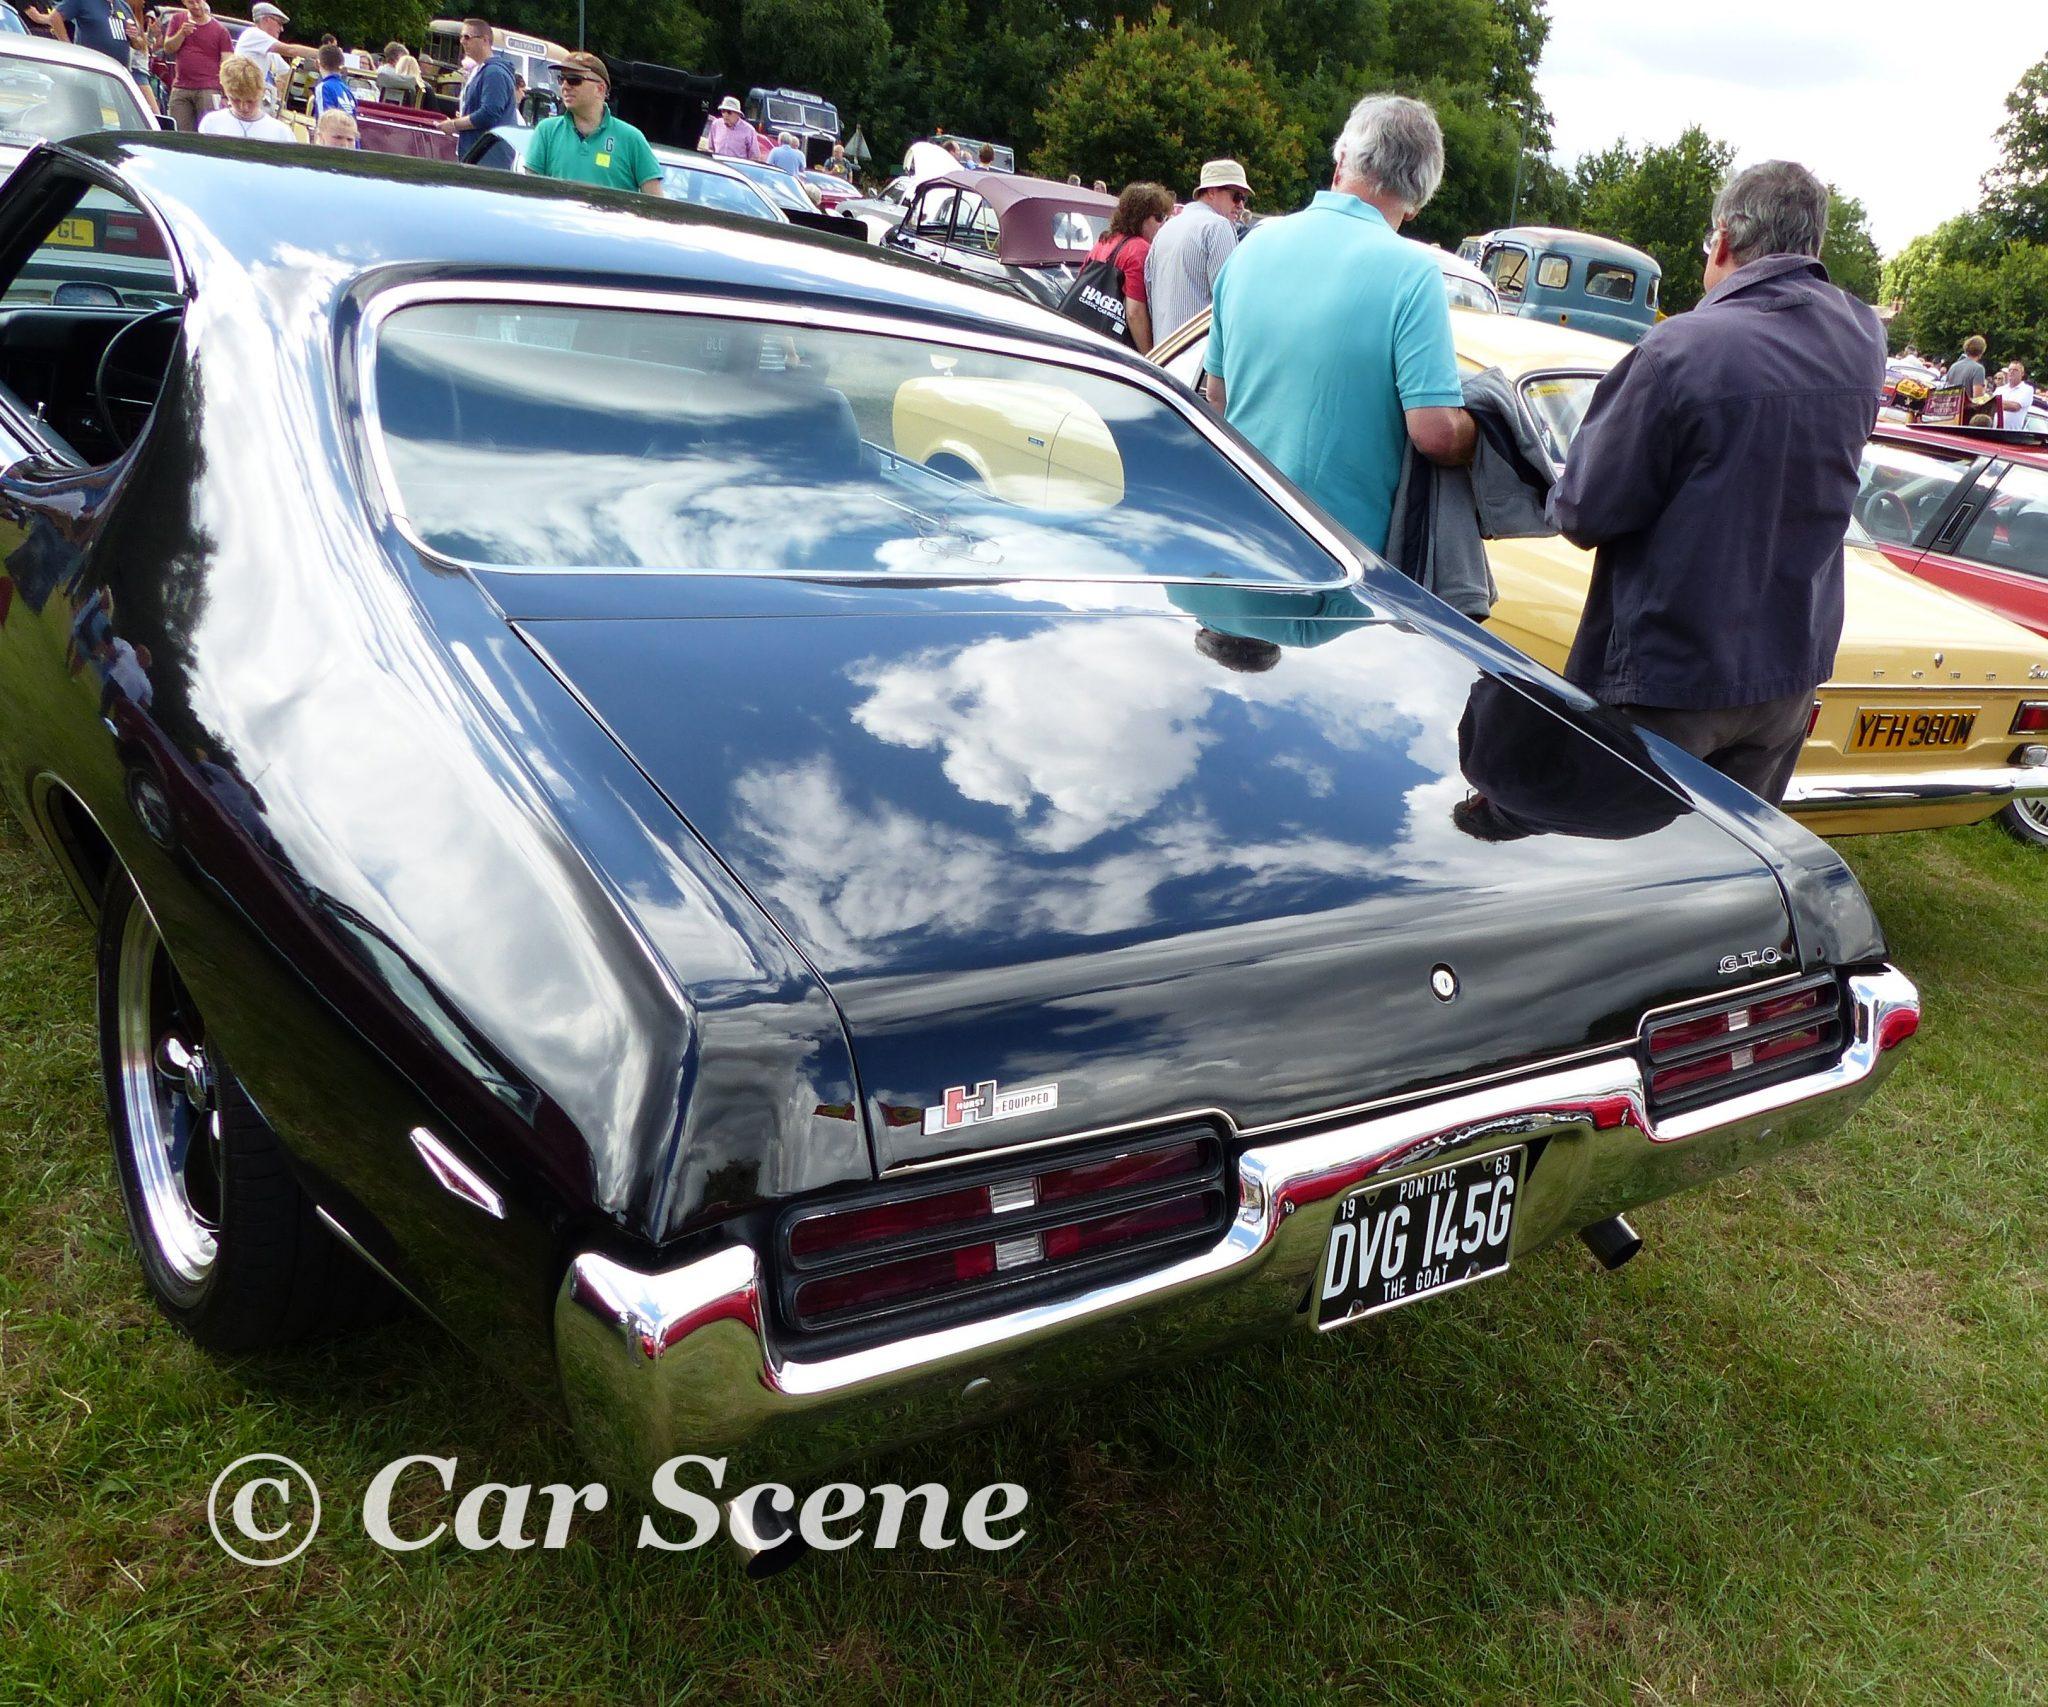 1968 Pontiac GTO rear view